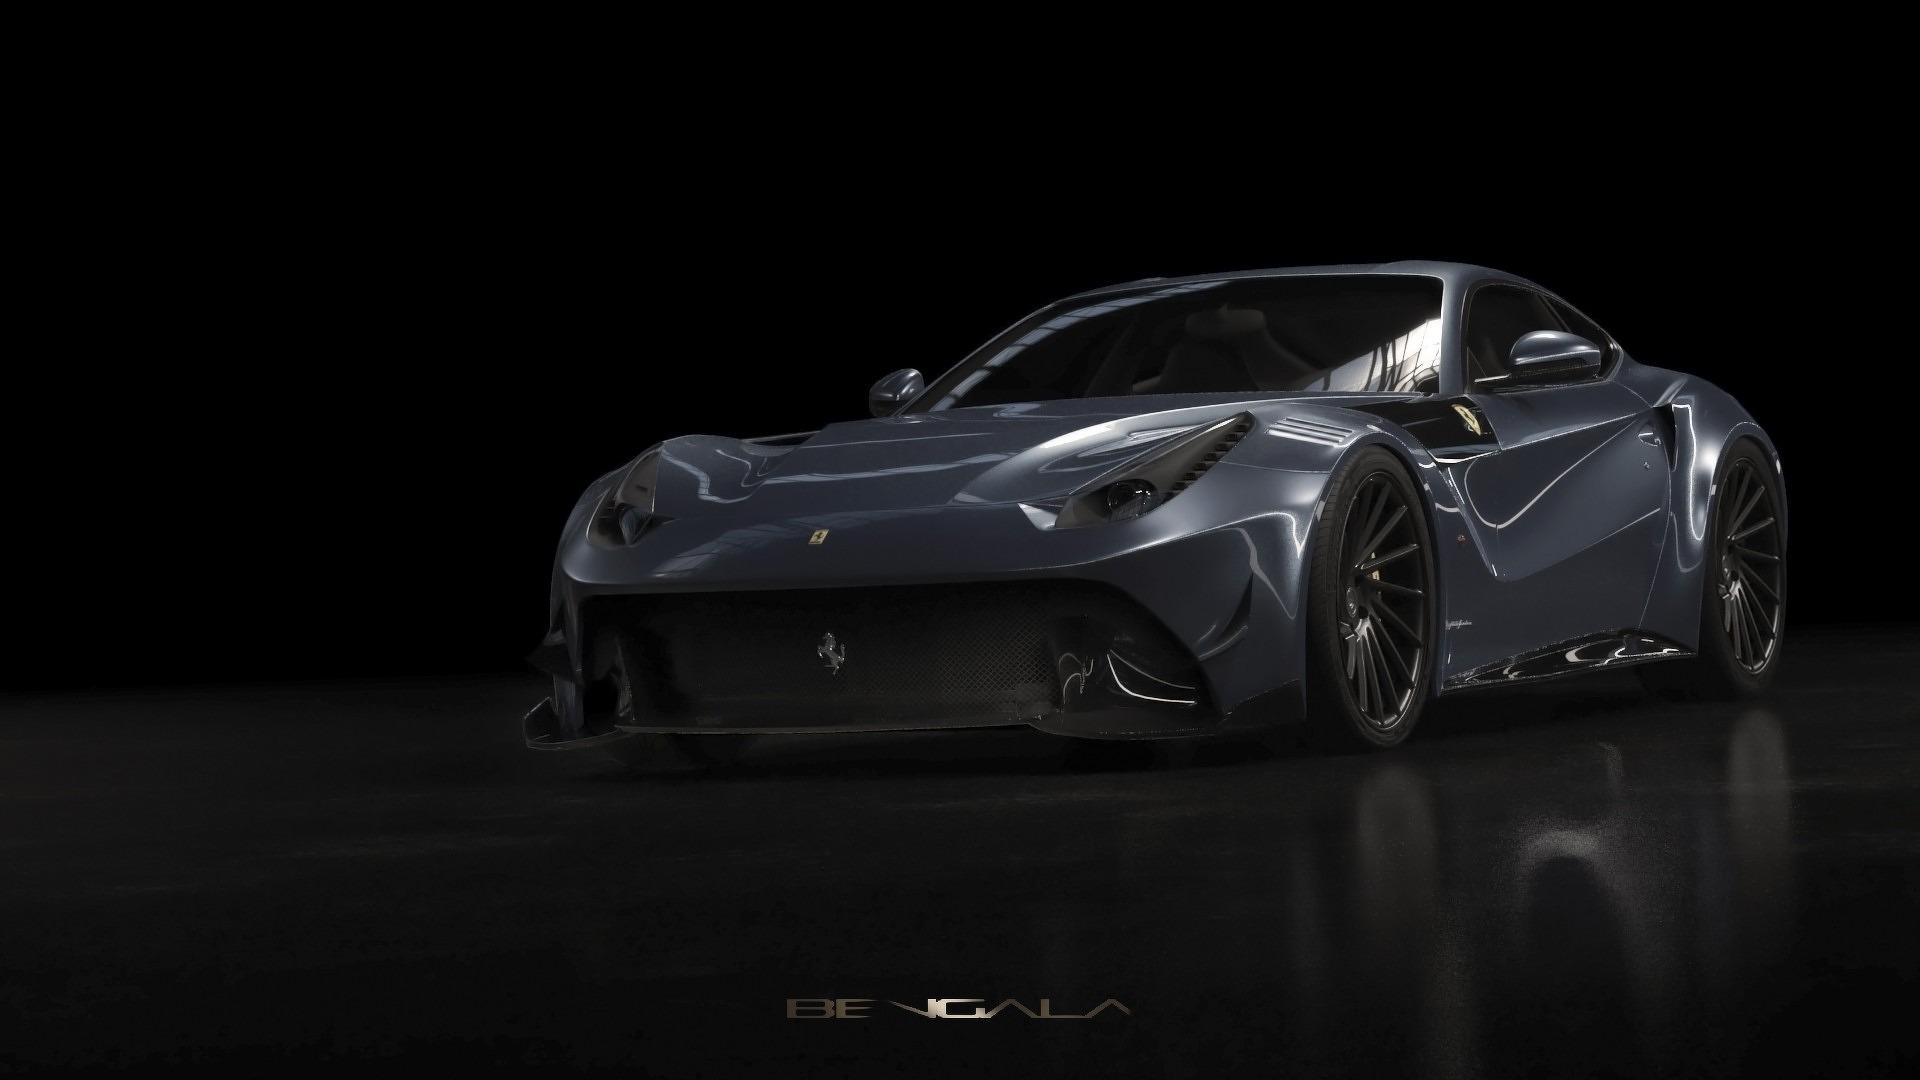 Bengala Ferrari F12 Caballeria is a carbon fiber fest